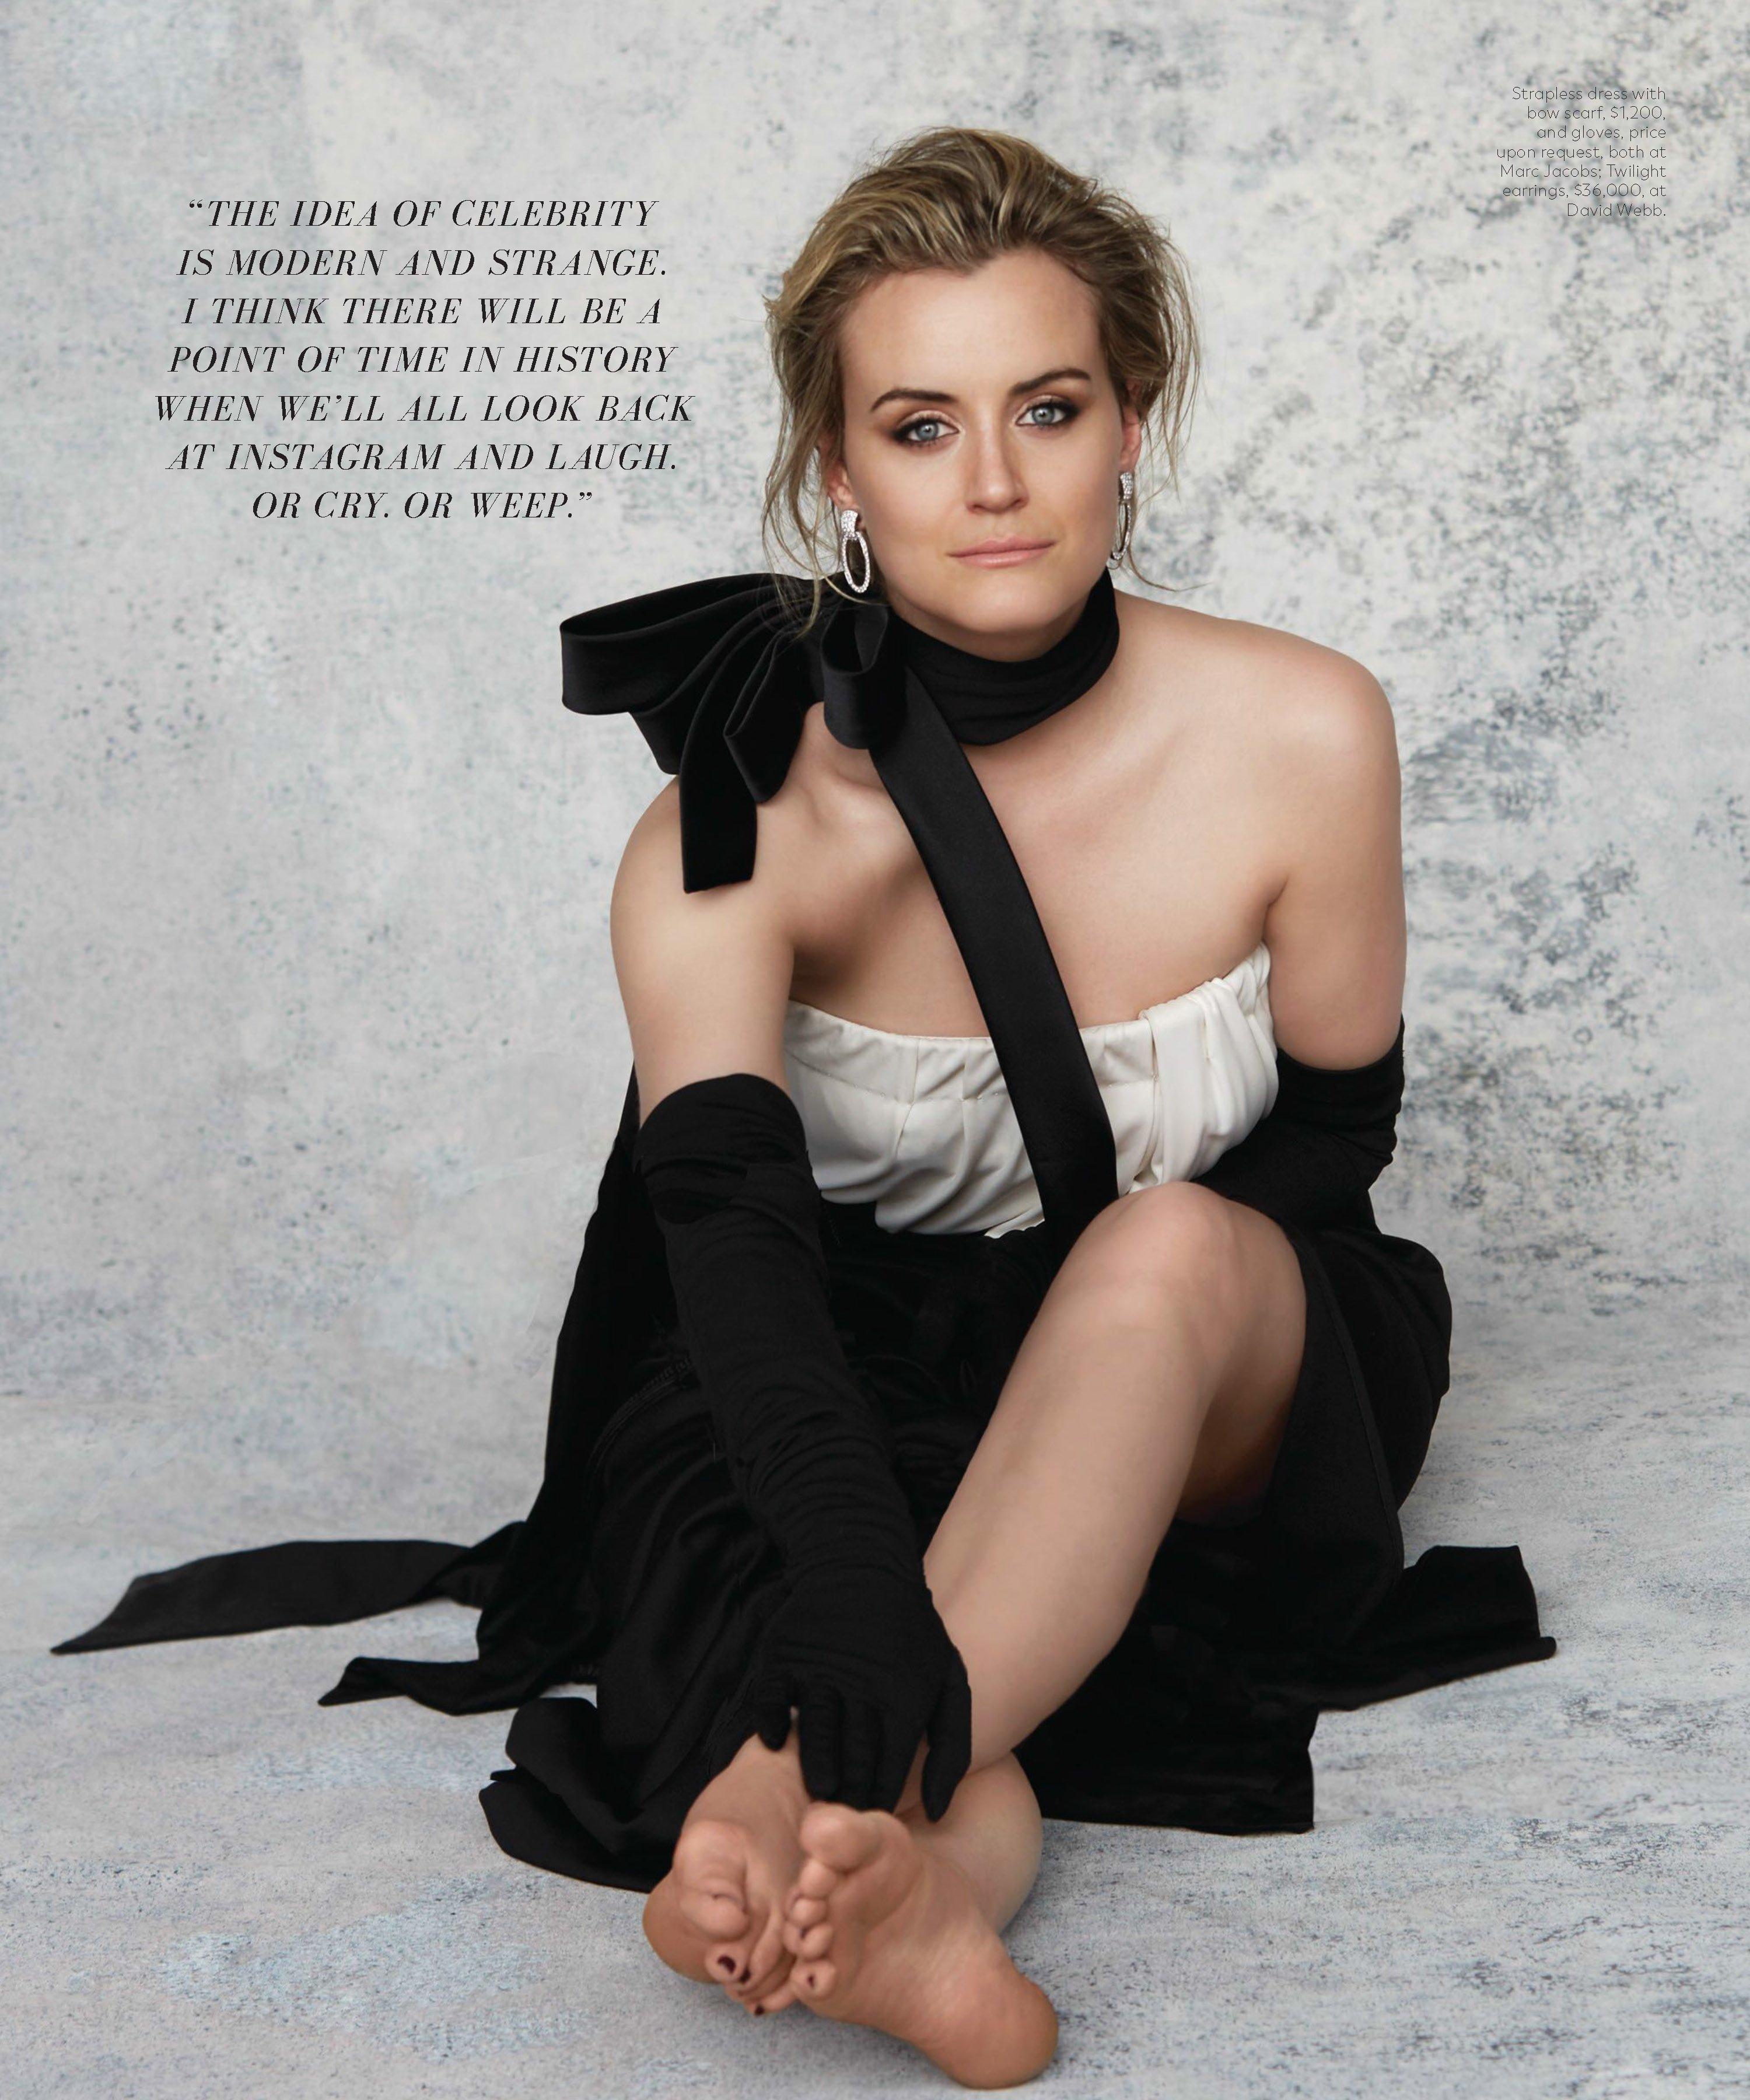 Amy Adams Wikifeet taylor schilling's feet << wikifeet